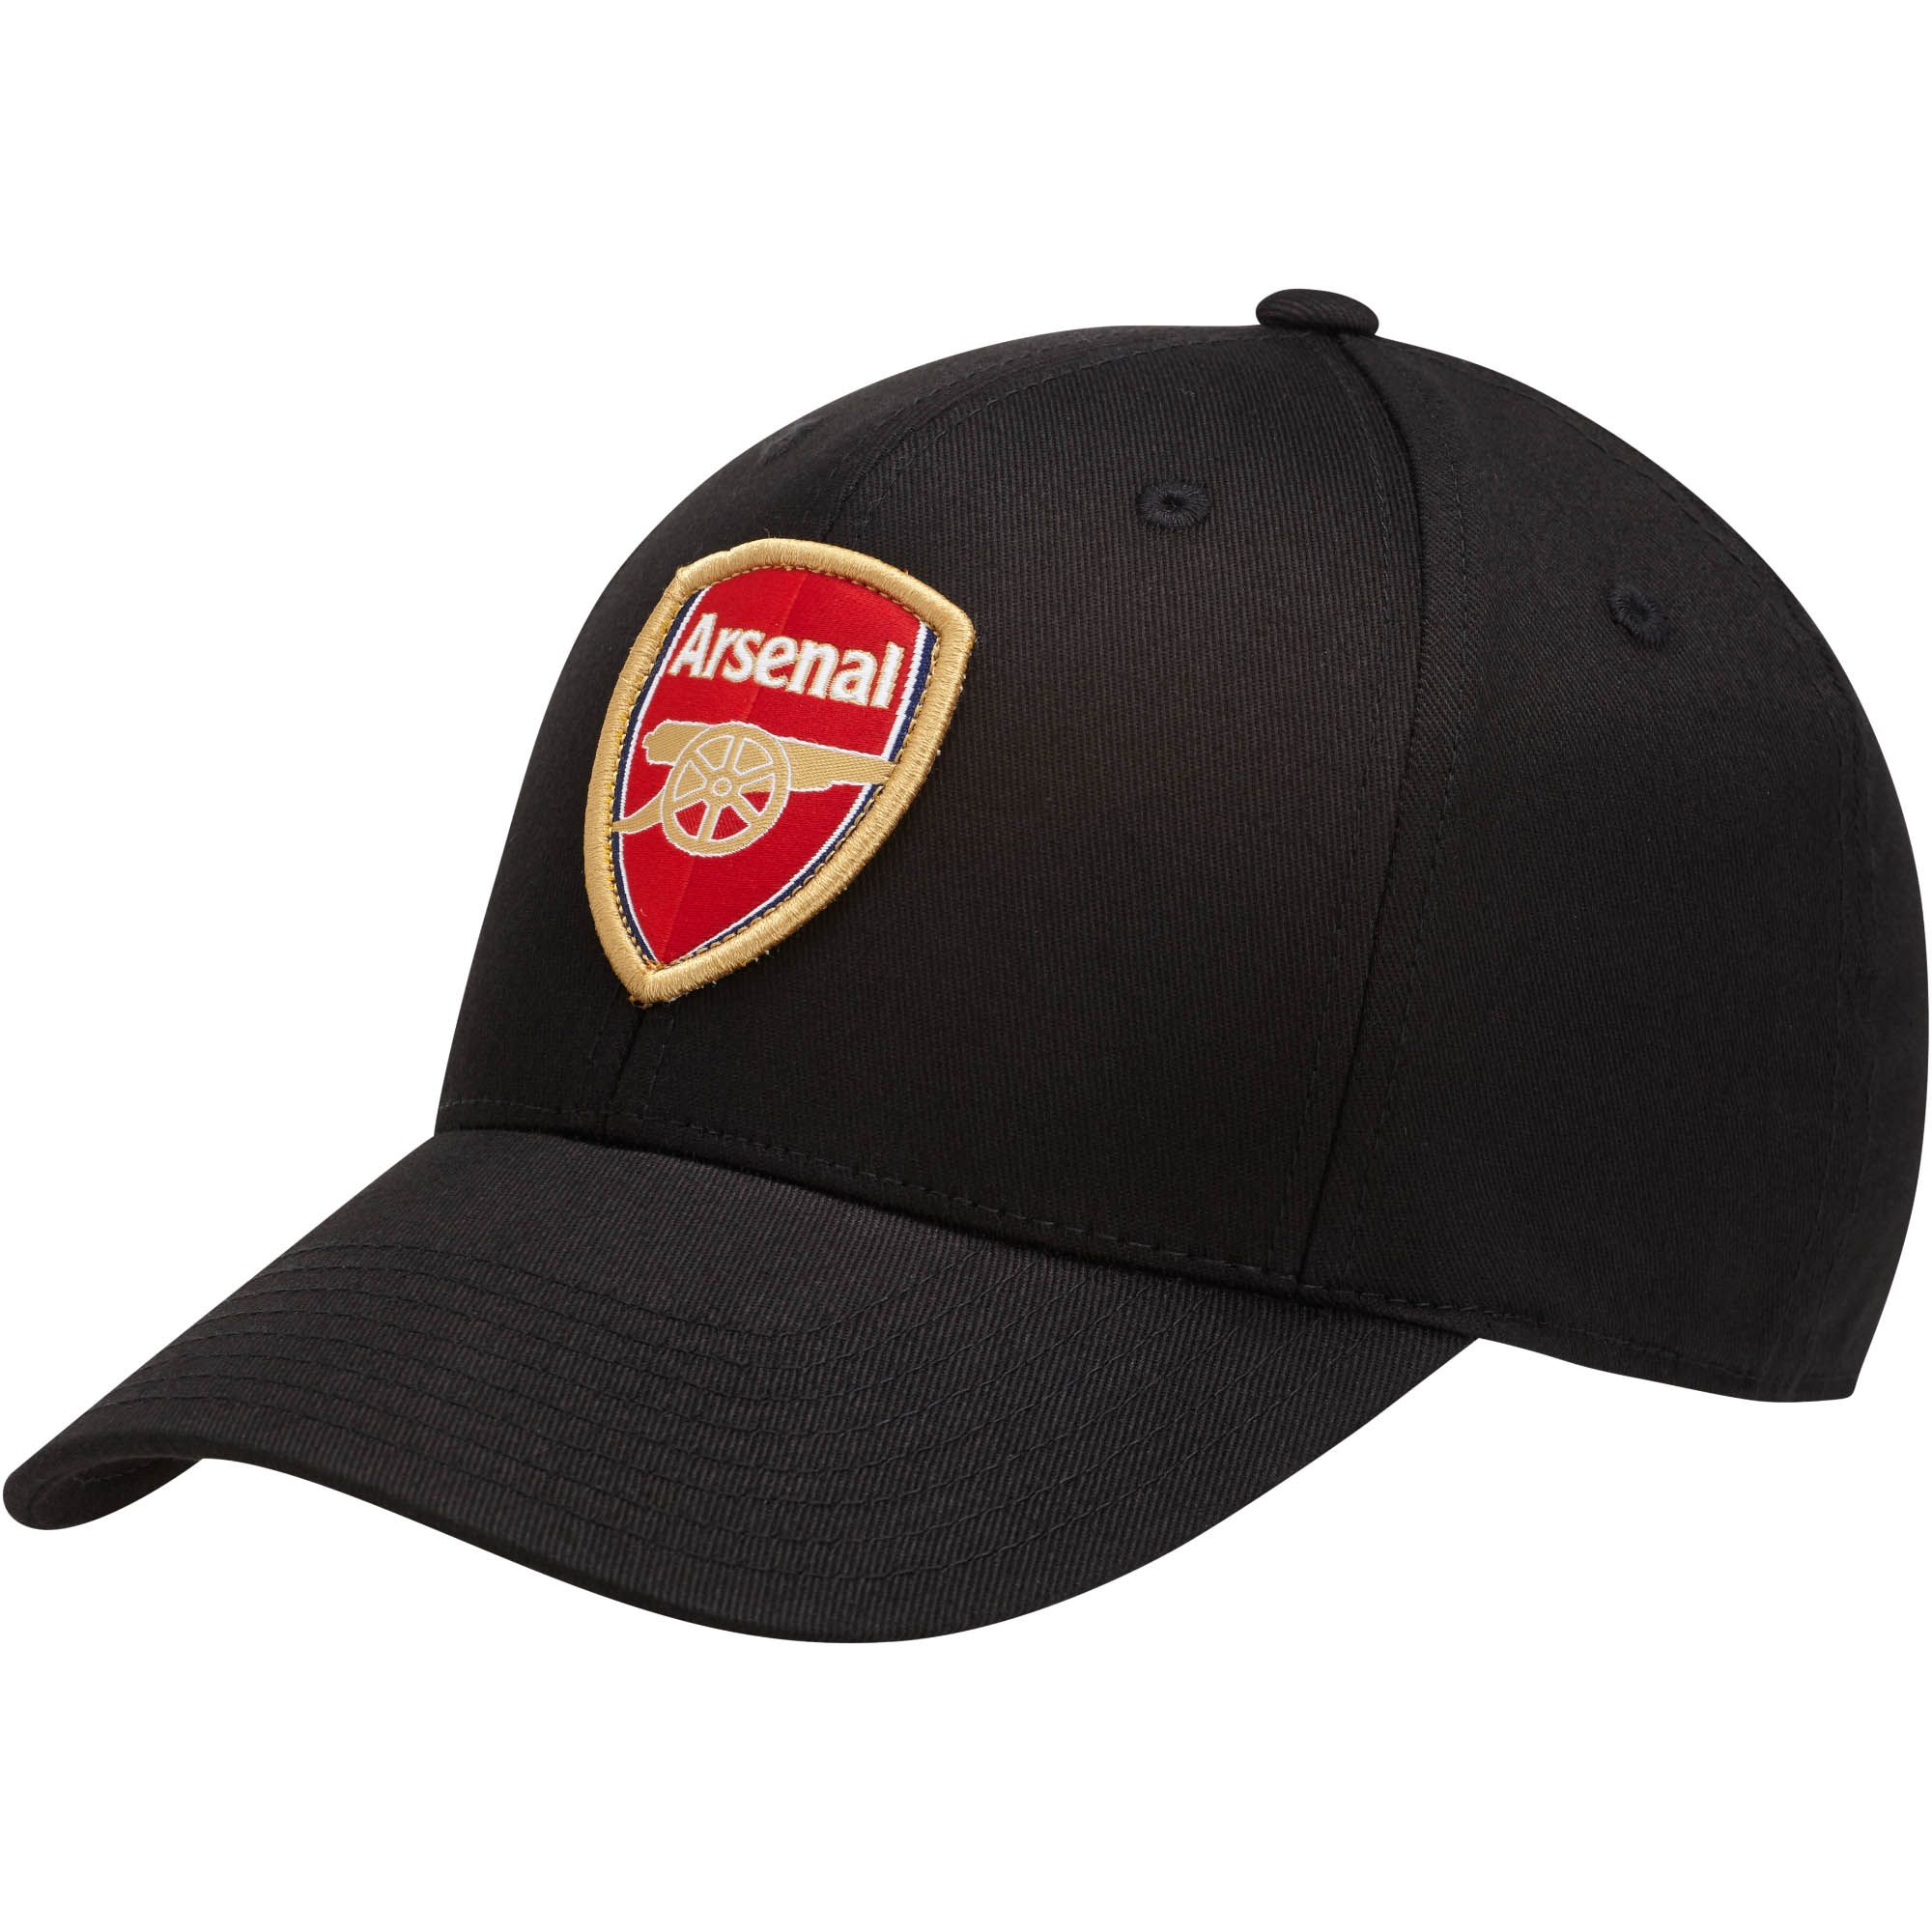 5dc1358aa55 Puma Arsenal Shield Snapback Cap - Black